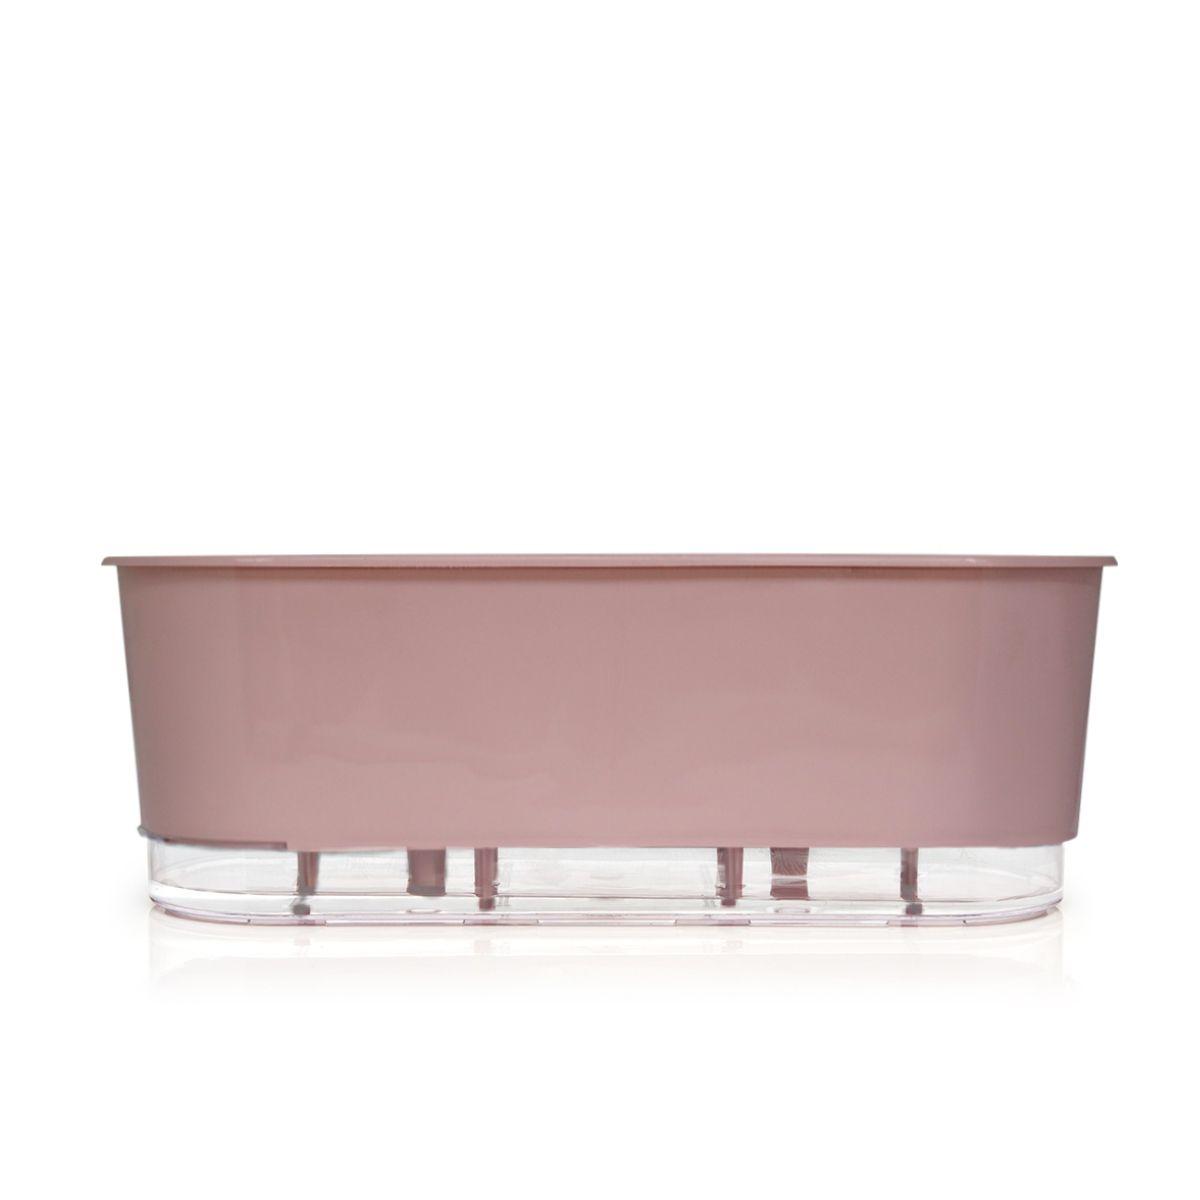 Jardineira Autoirrigável 40 cm Rosa  - Vasos Raiz Loja Oficial